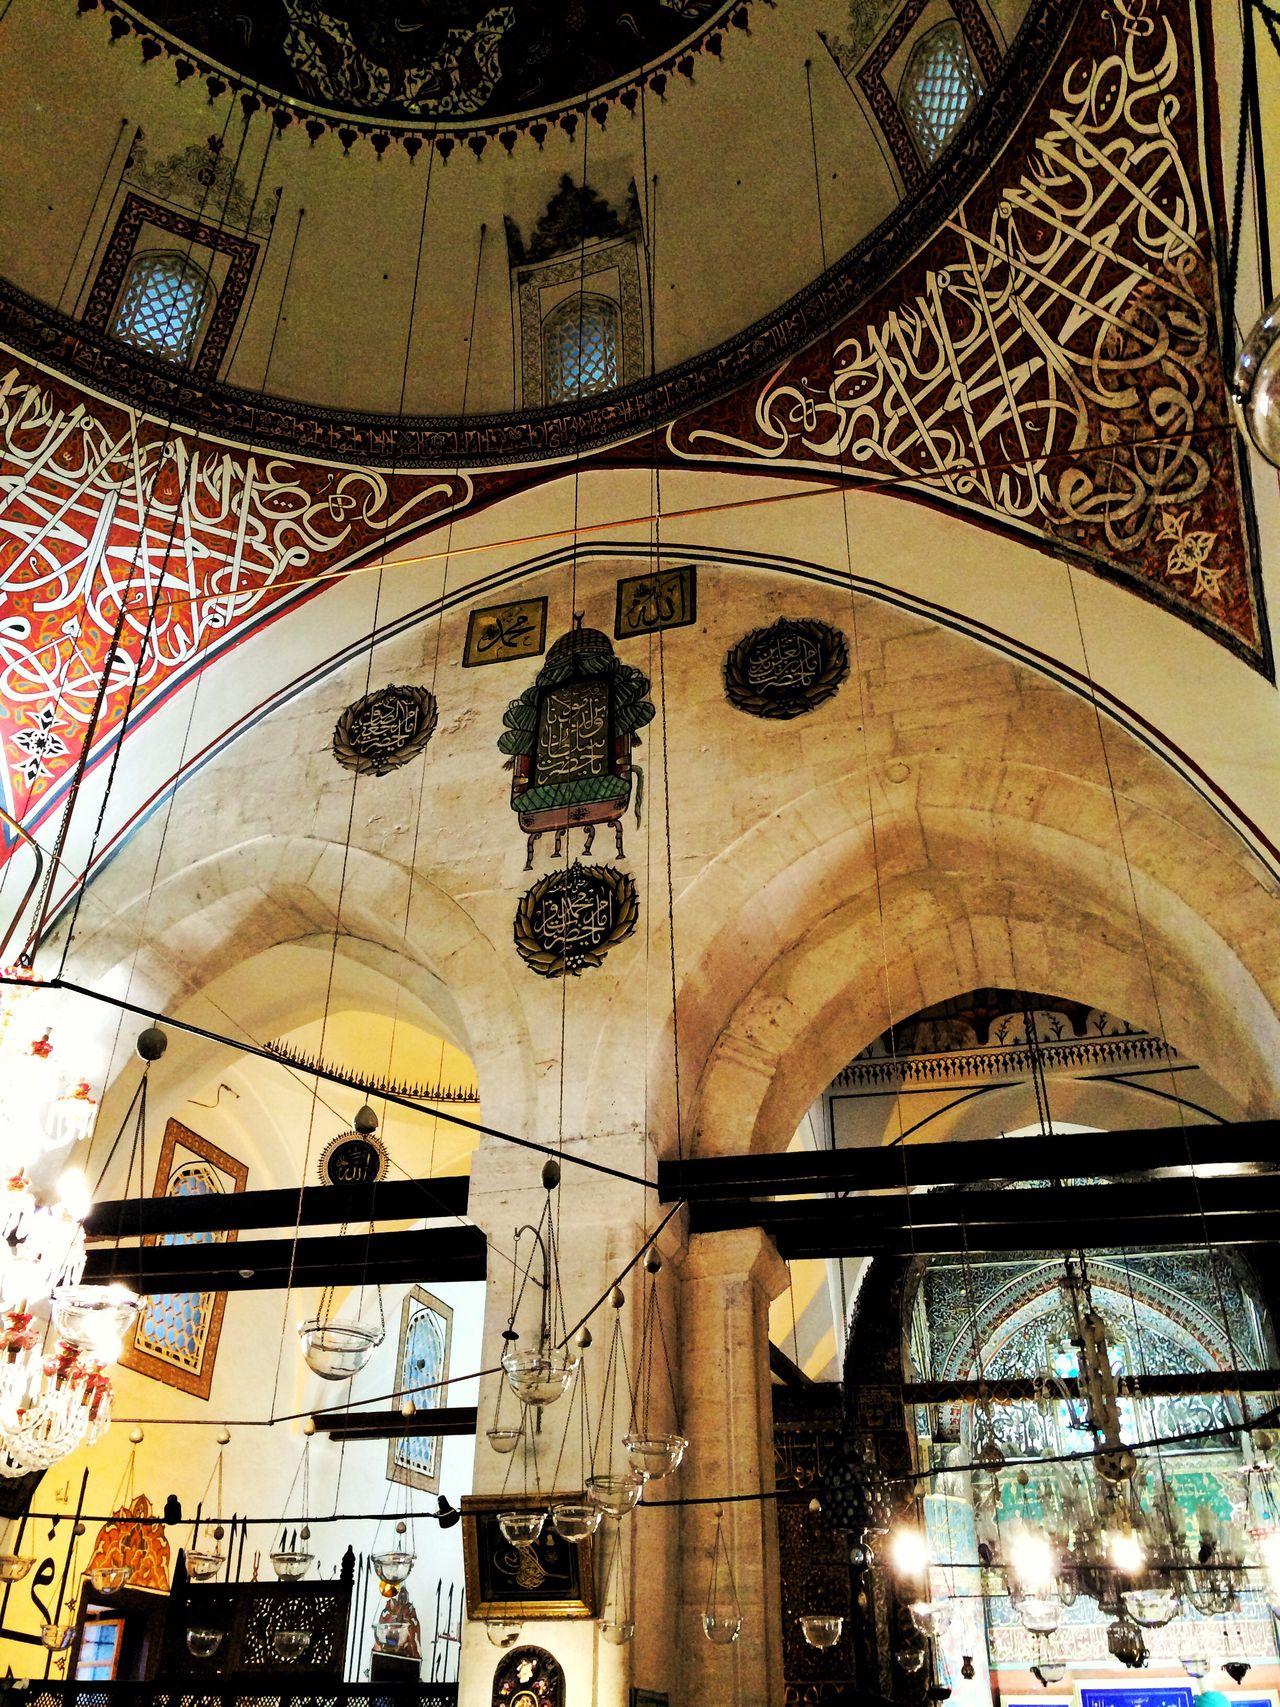 Turkey Mosque Arts Culture And Entertainment Architecture City Konya Turkey Mevlana Mosque Mevlana Türbesi